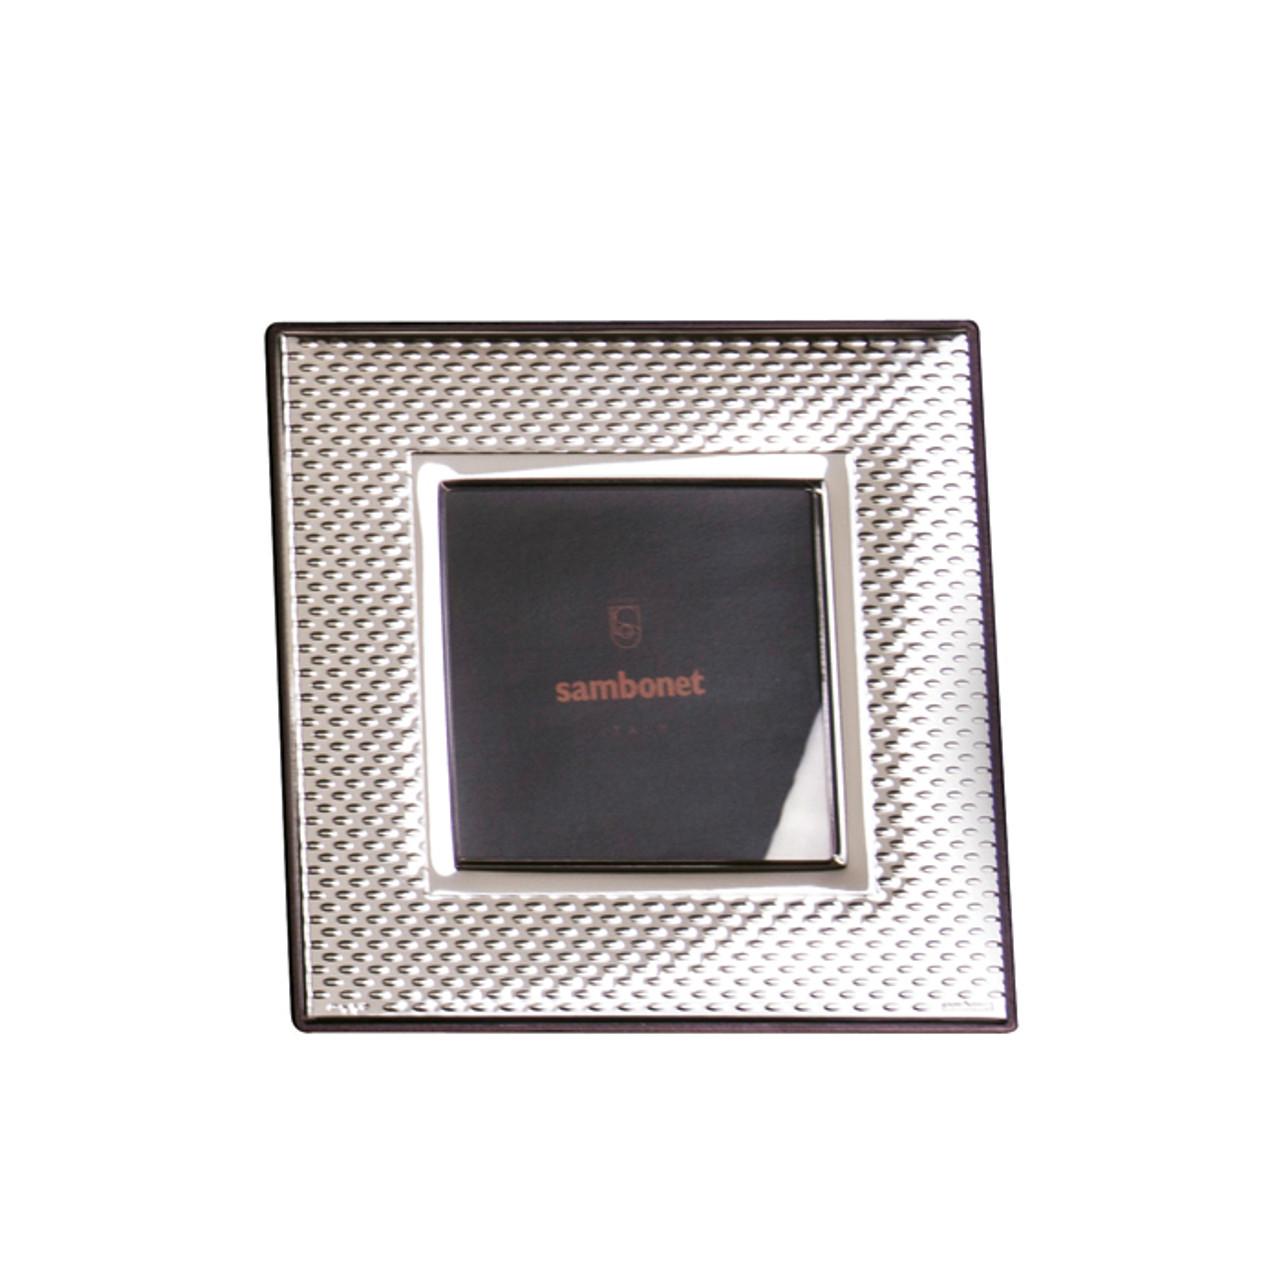 Frames Dew Frame, 3 1/2 x 3 1/2 inch | Sambonet Online Store